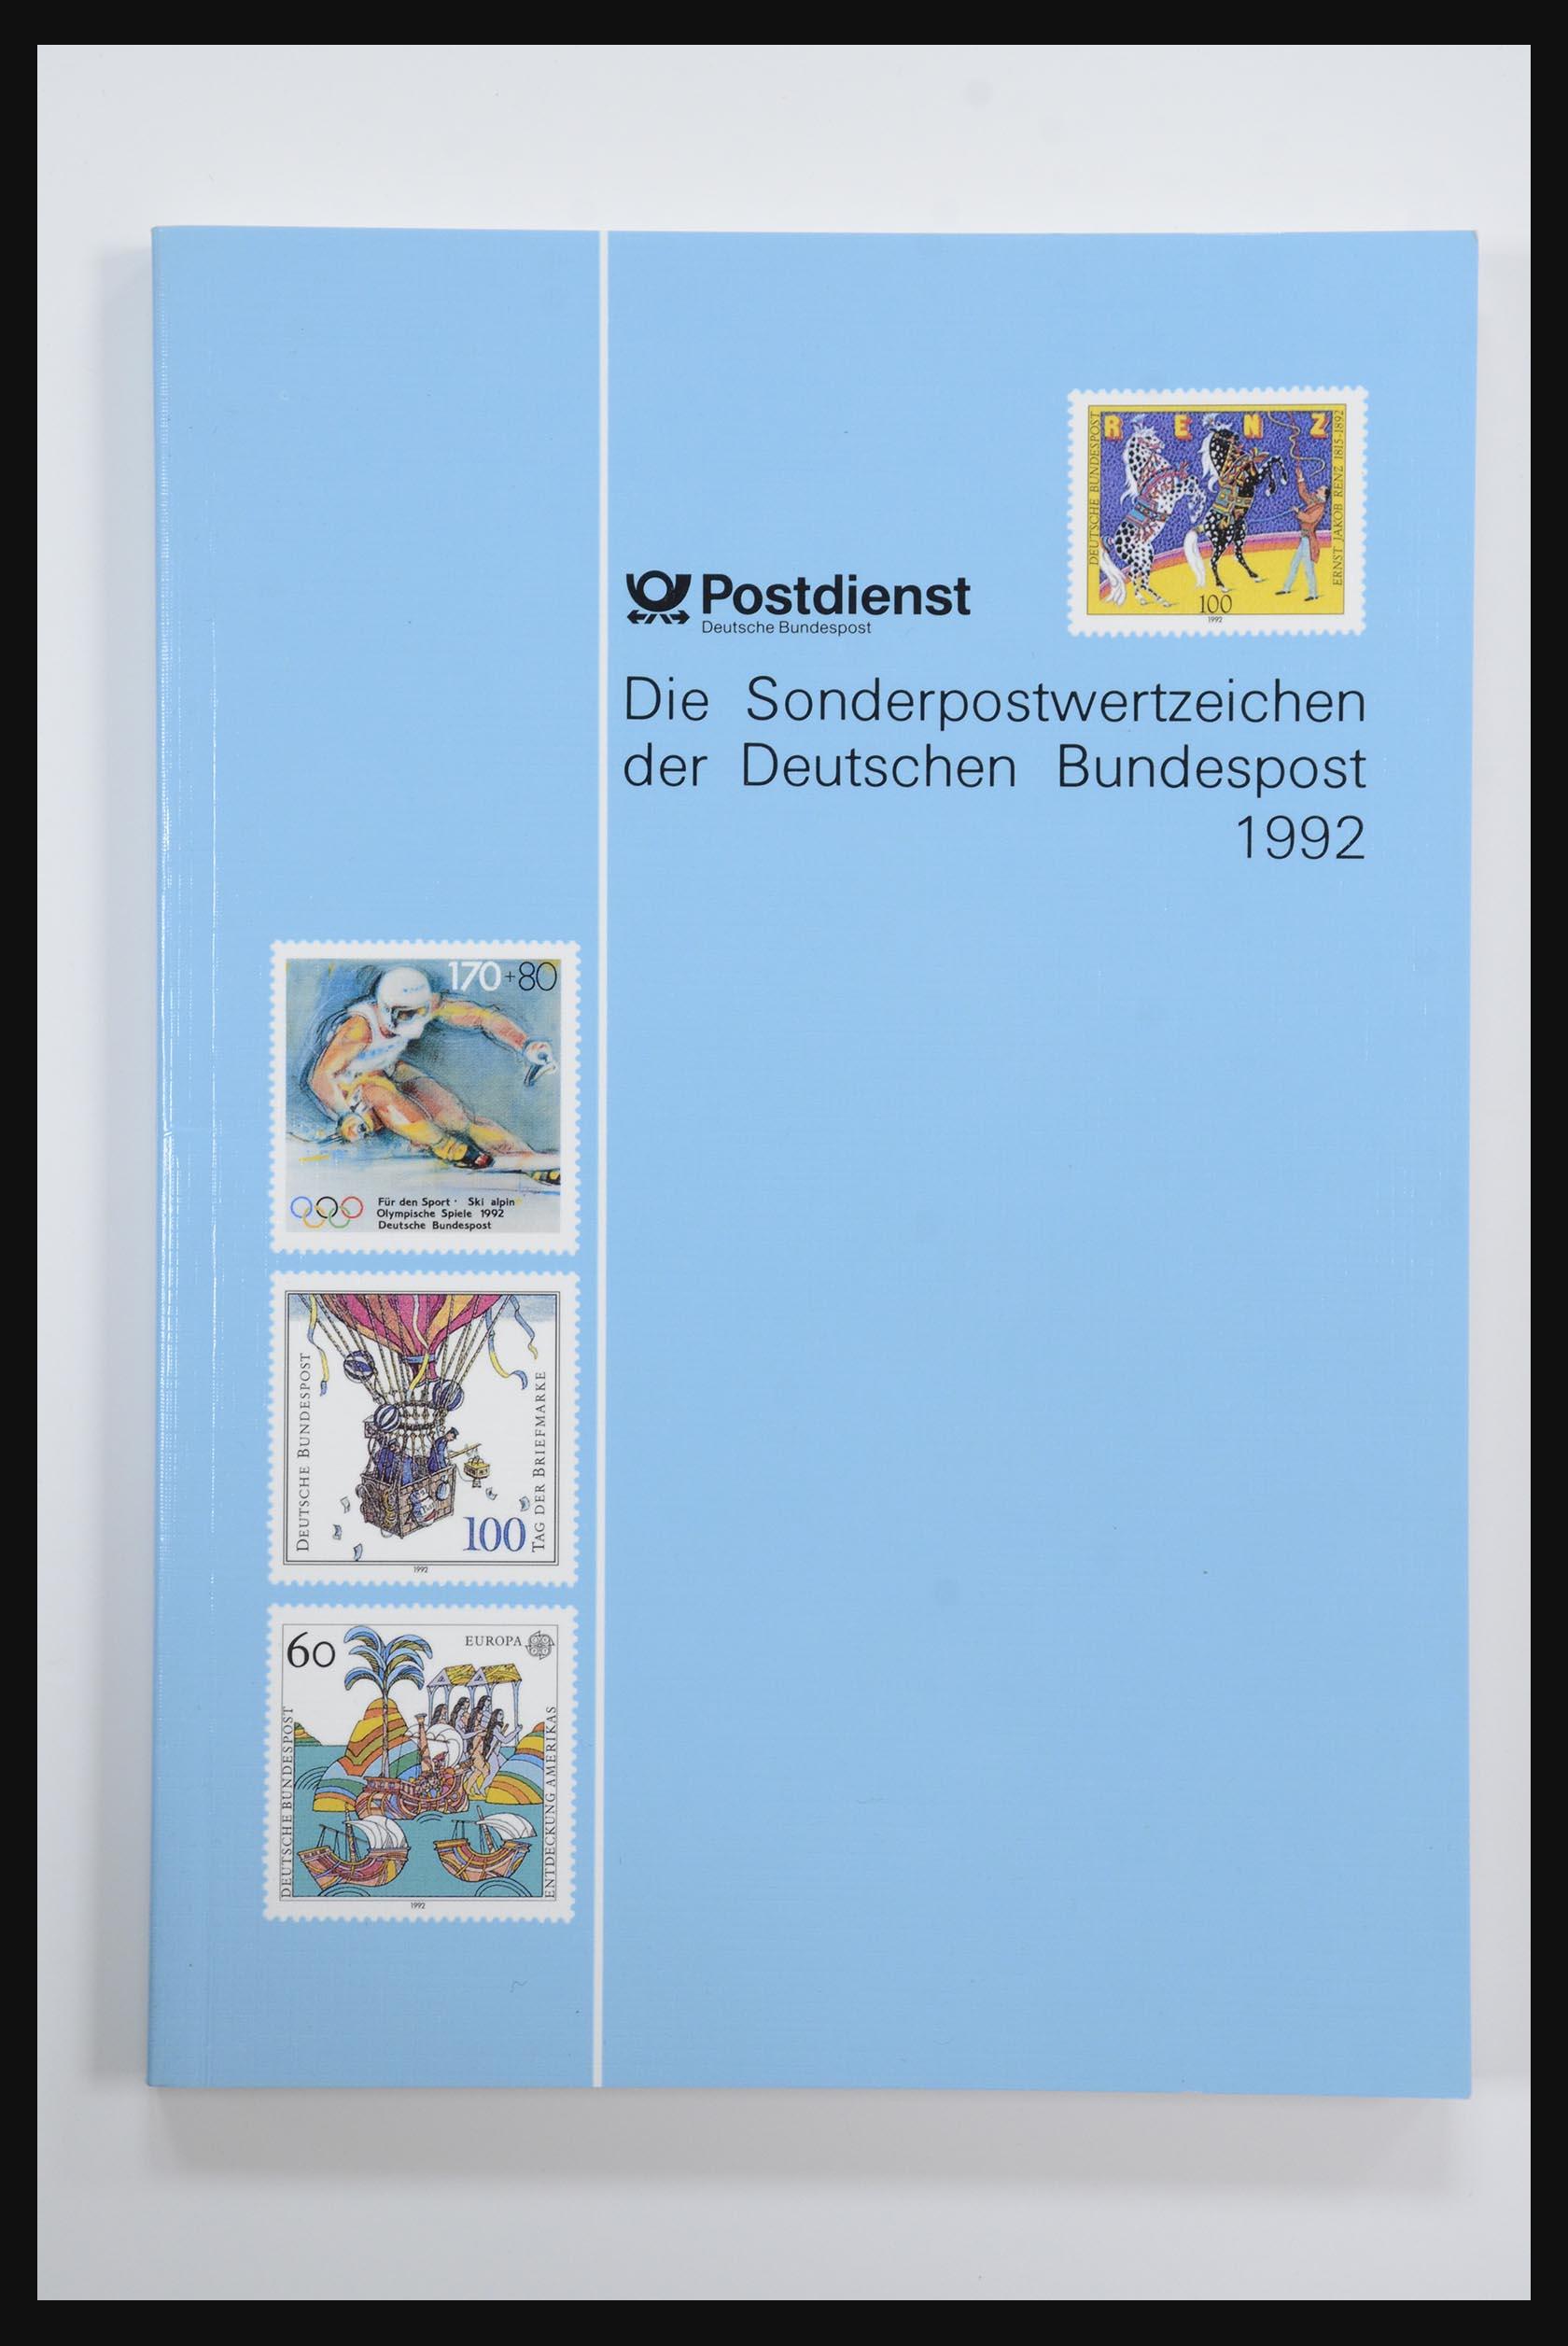 31834 020 - 31834 Bundespost yearbooks 1973(!)-1999.